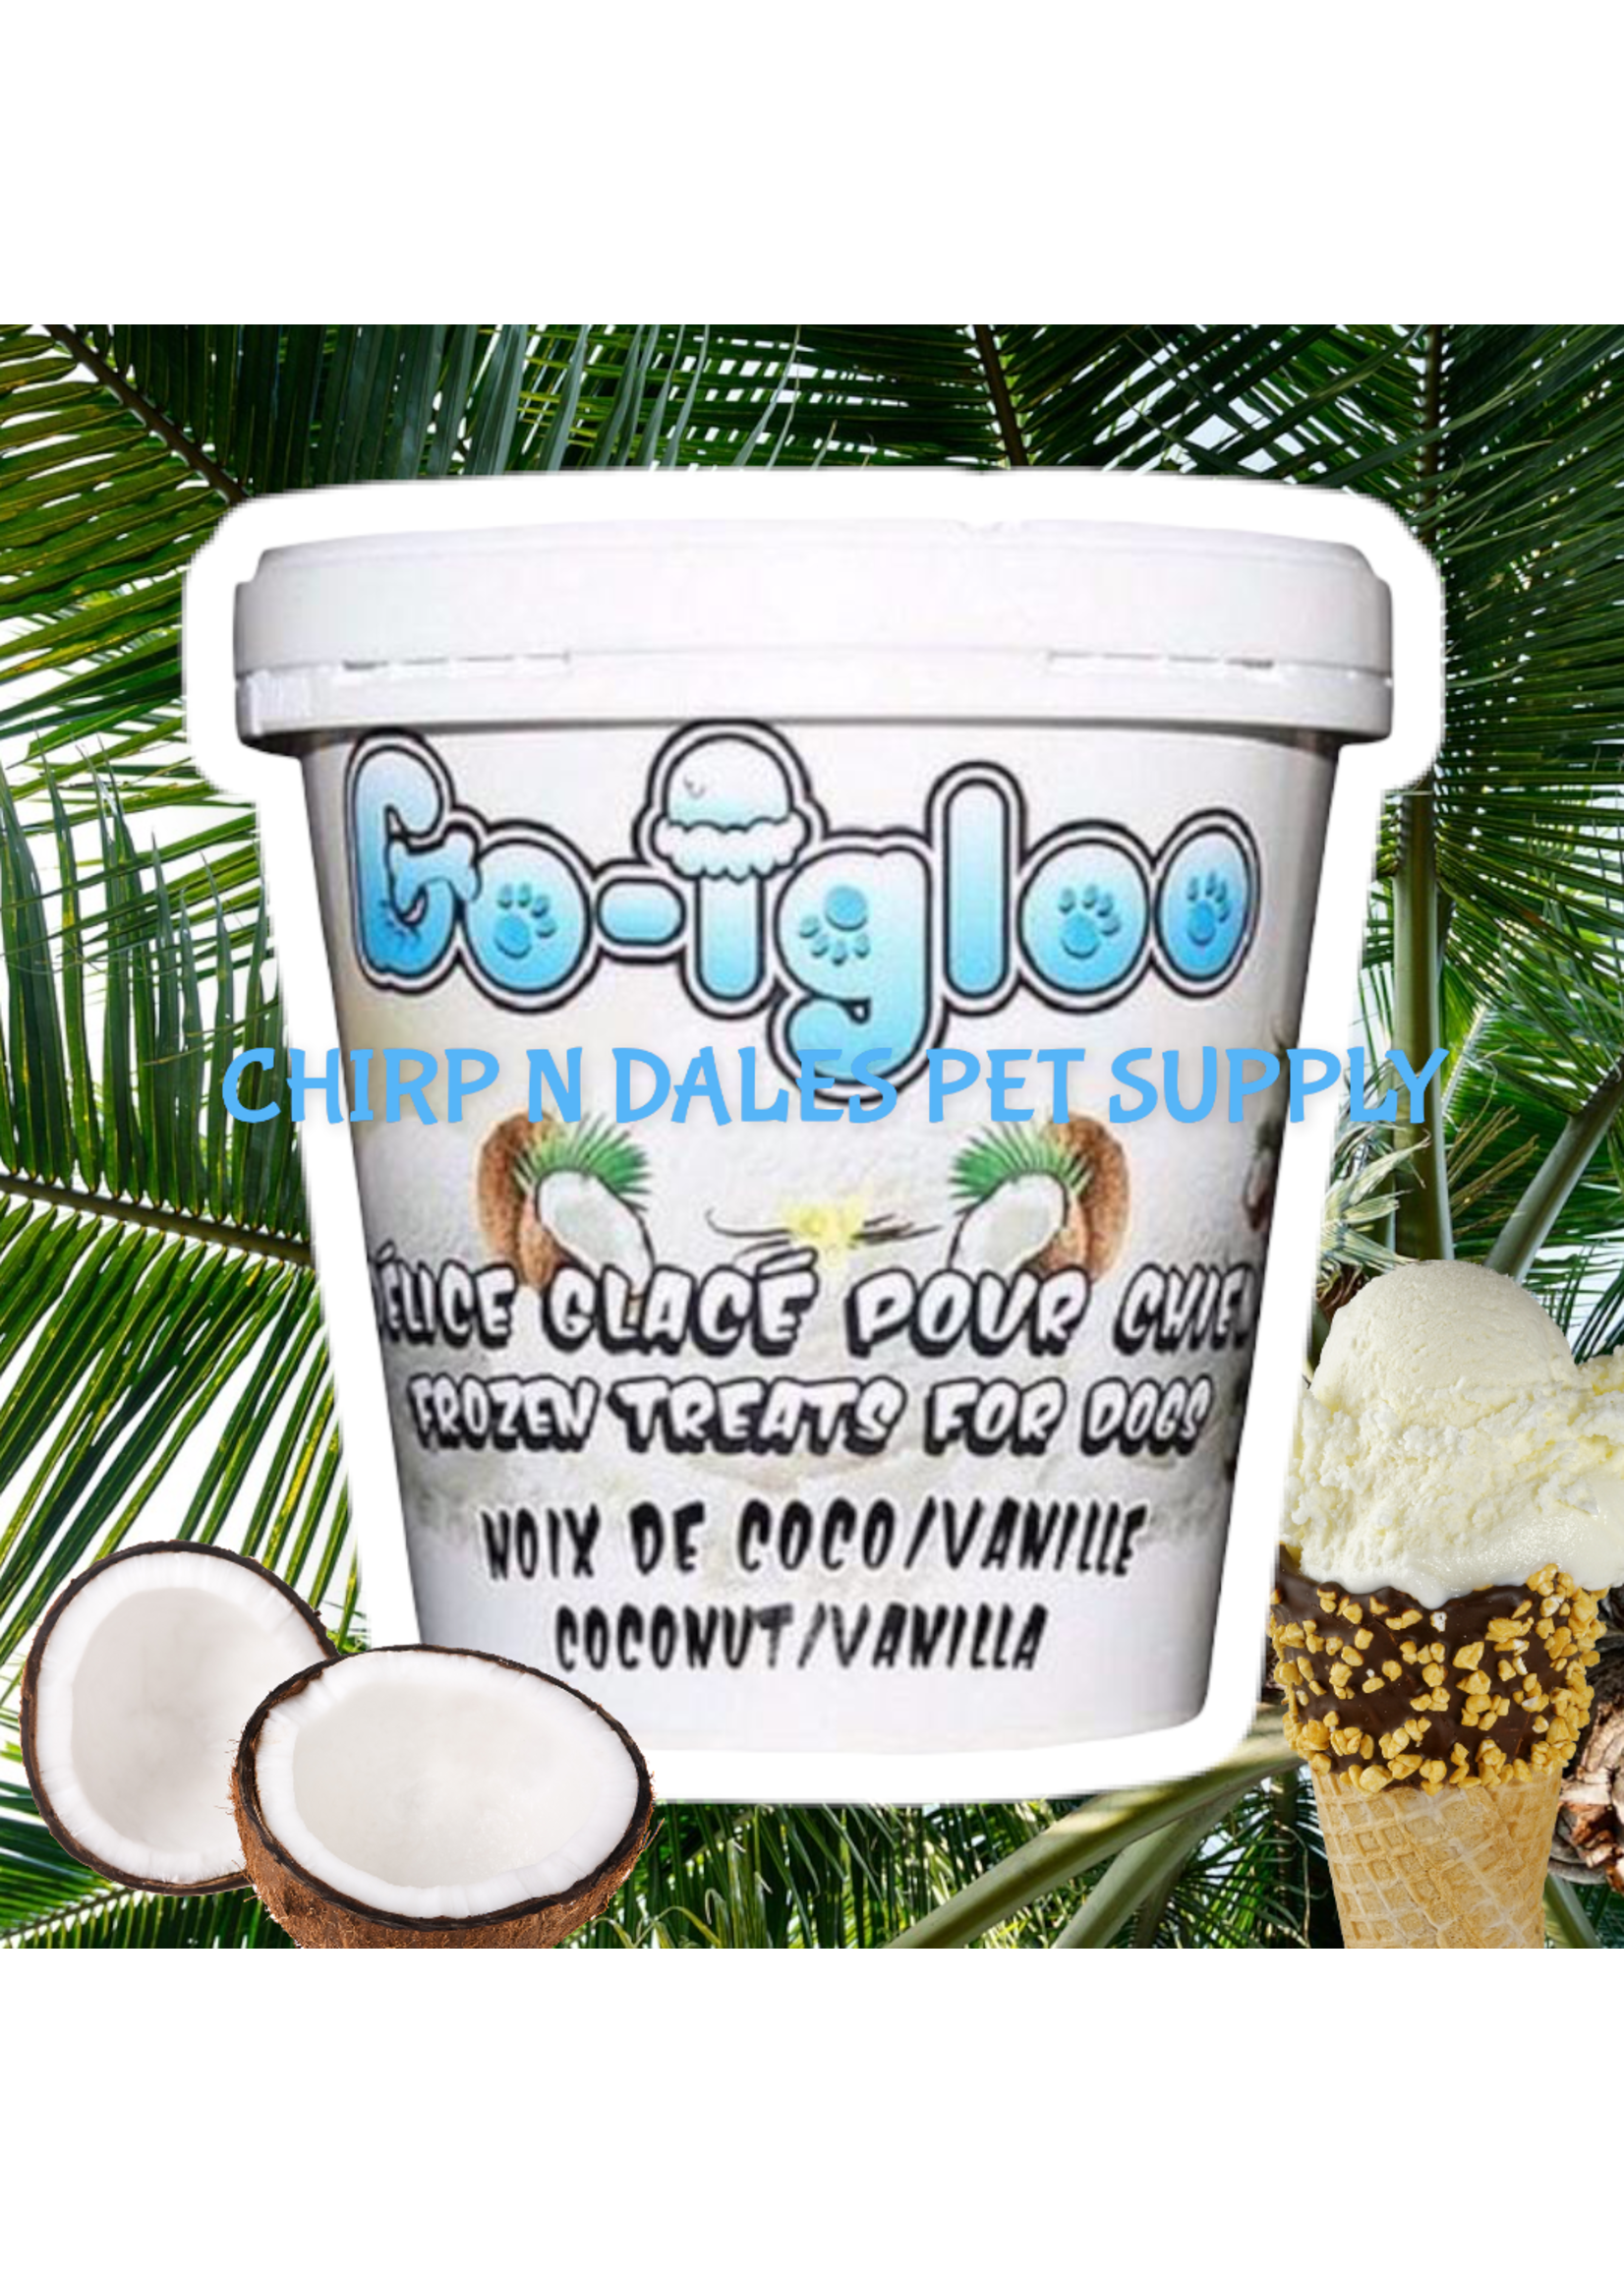 Go Igloo Coconut/Vanilla Frozen Treat